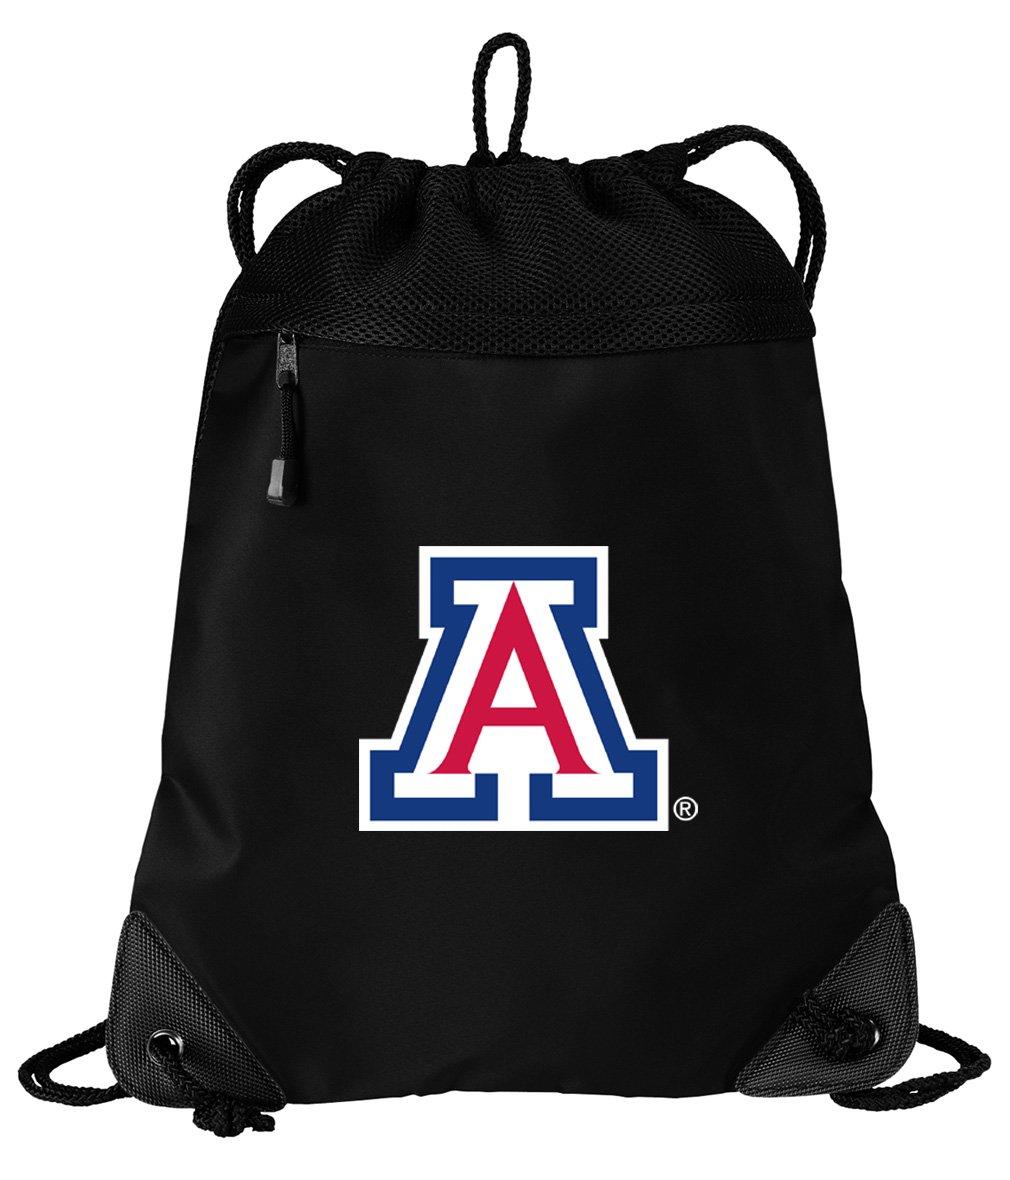 c8fcc96a9d Broad Bay Arizona Wildcats Drawstring Bag University of Arizona Cinch Pack  Backpack UNIQUE MESH   MICROFIBER